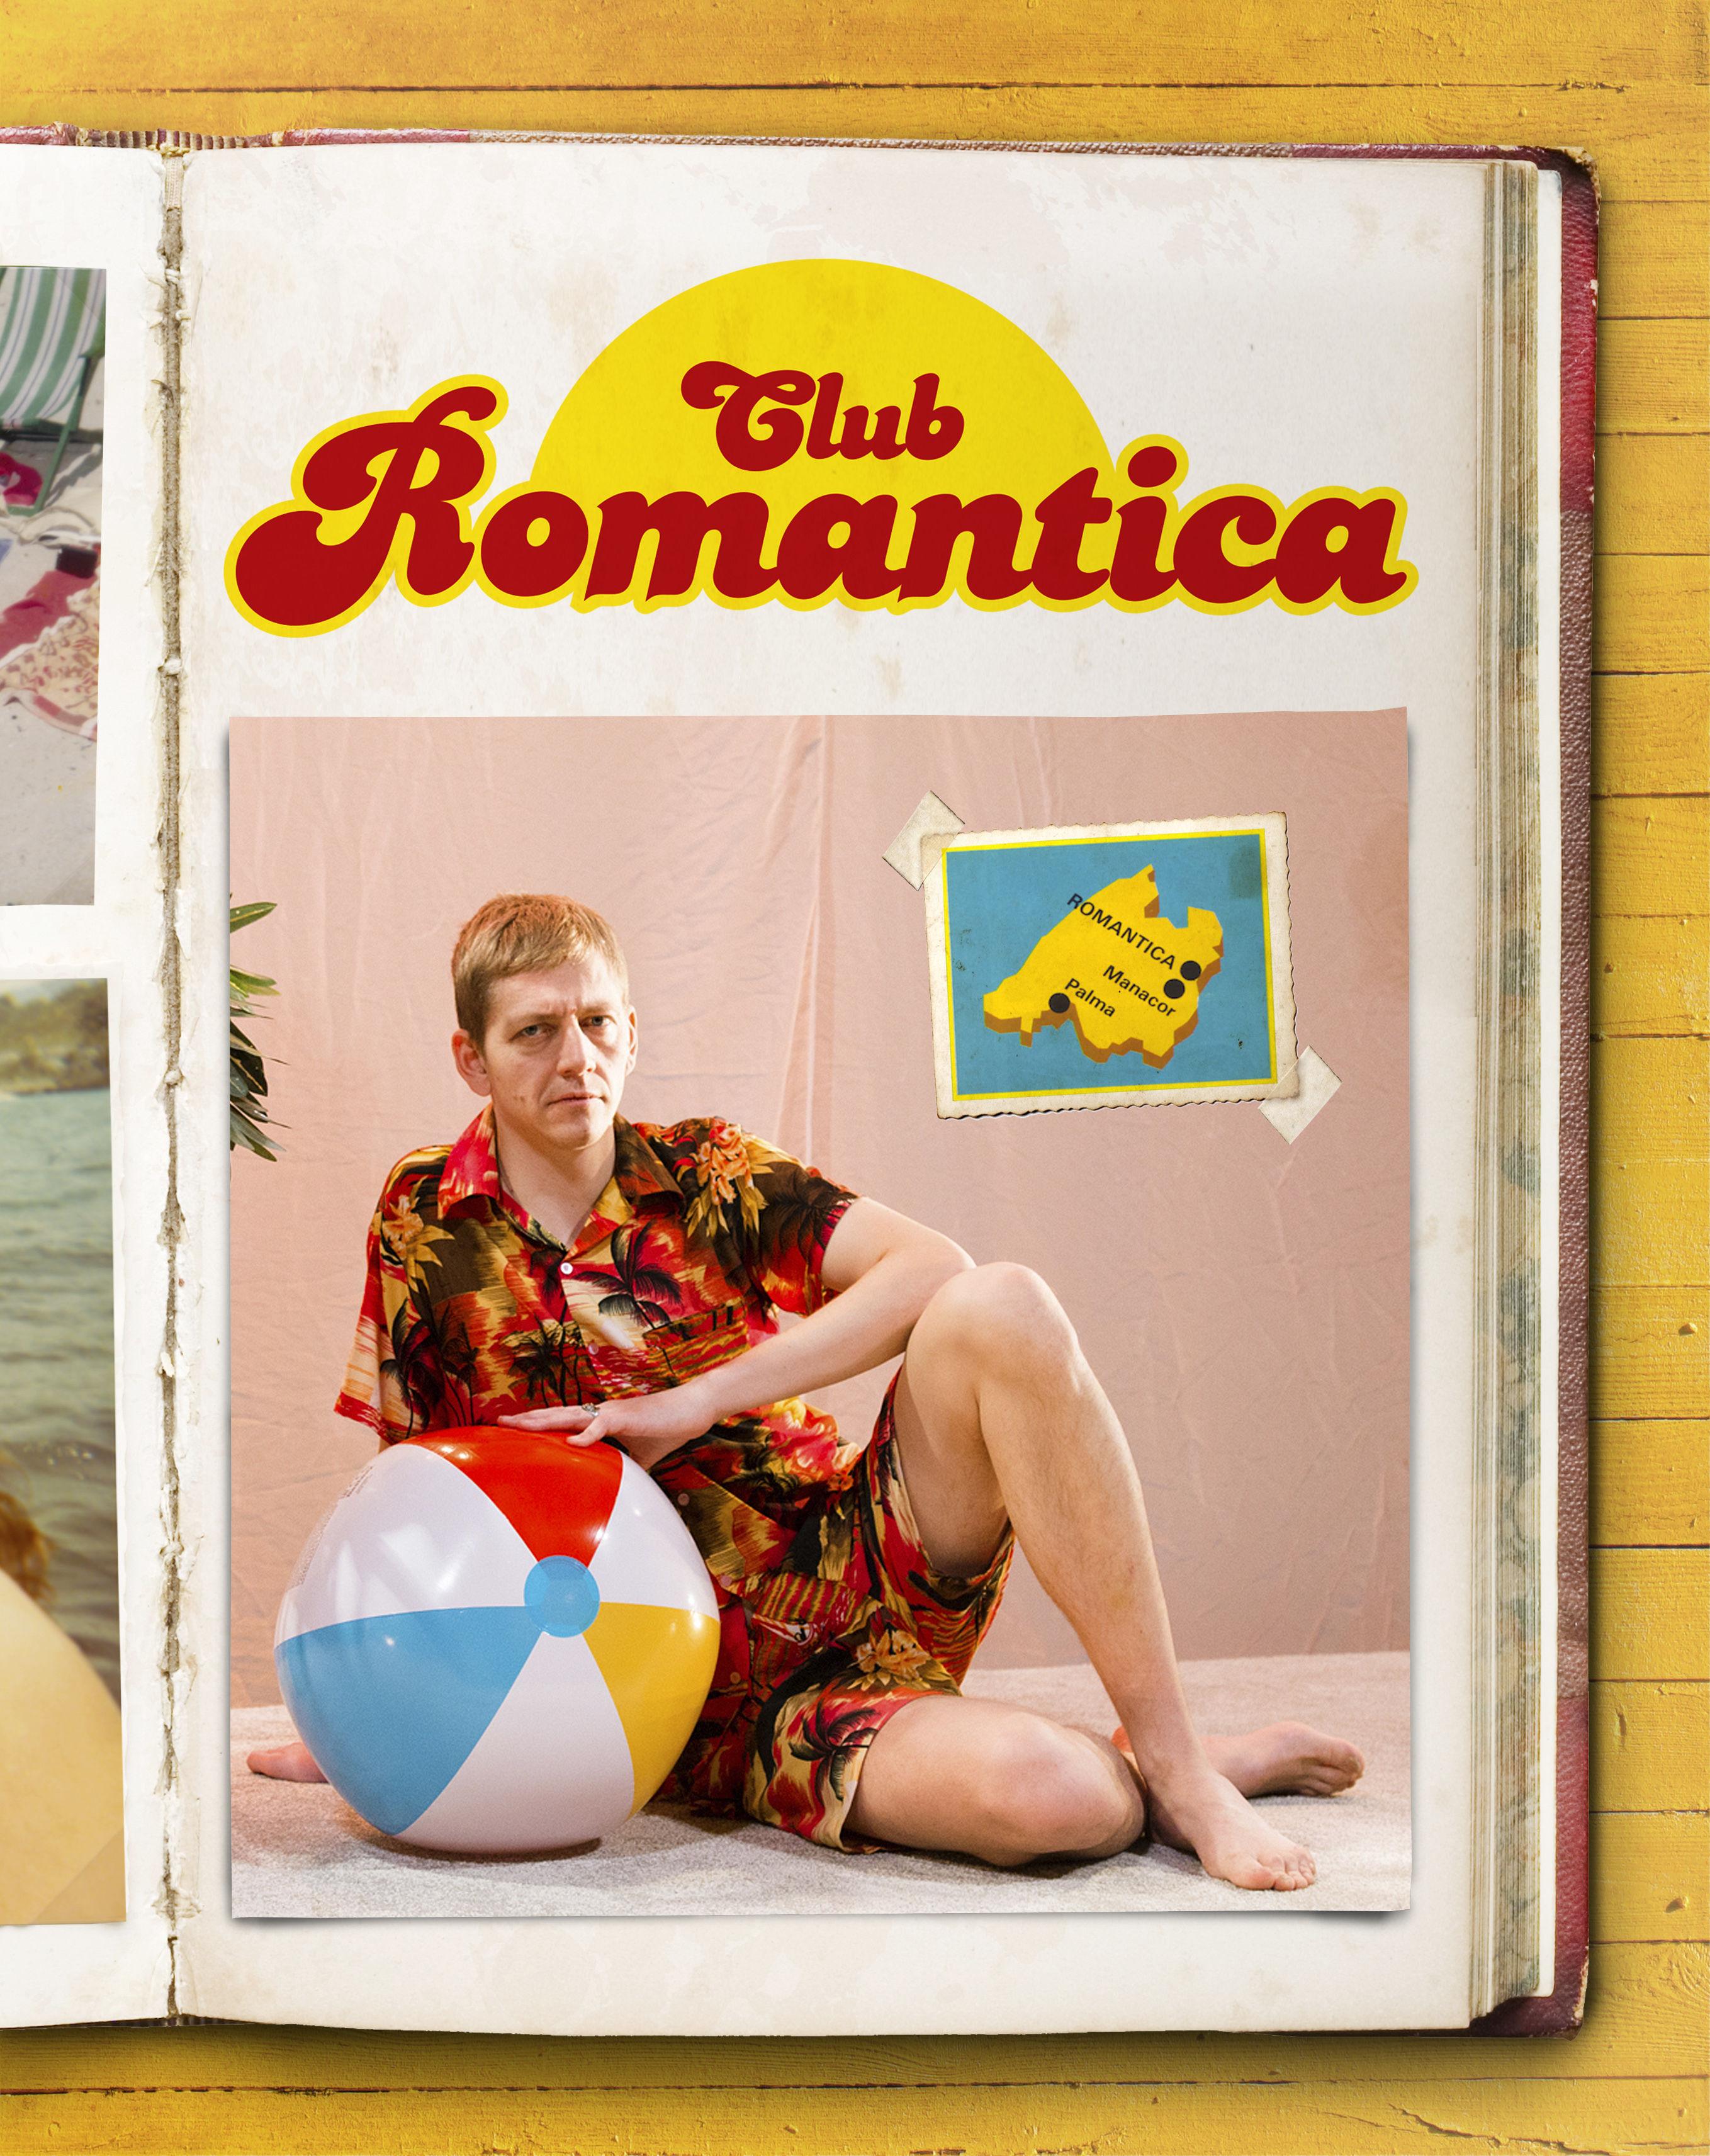 Club Romantica